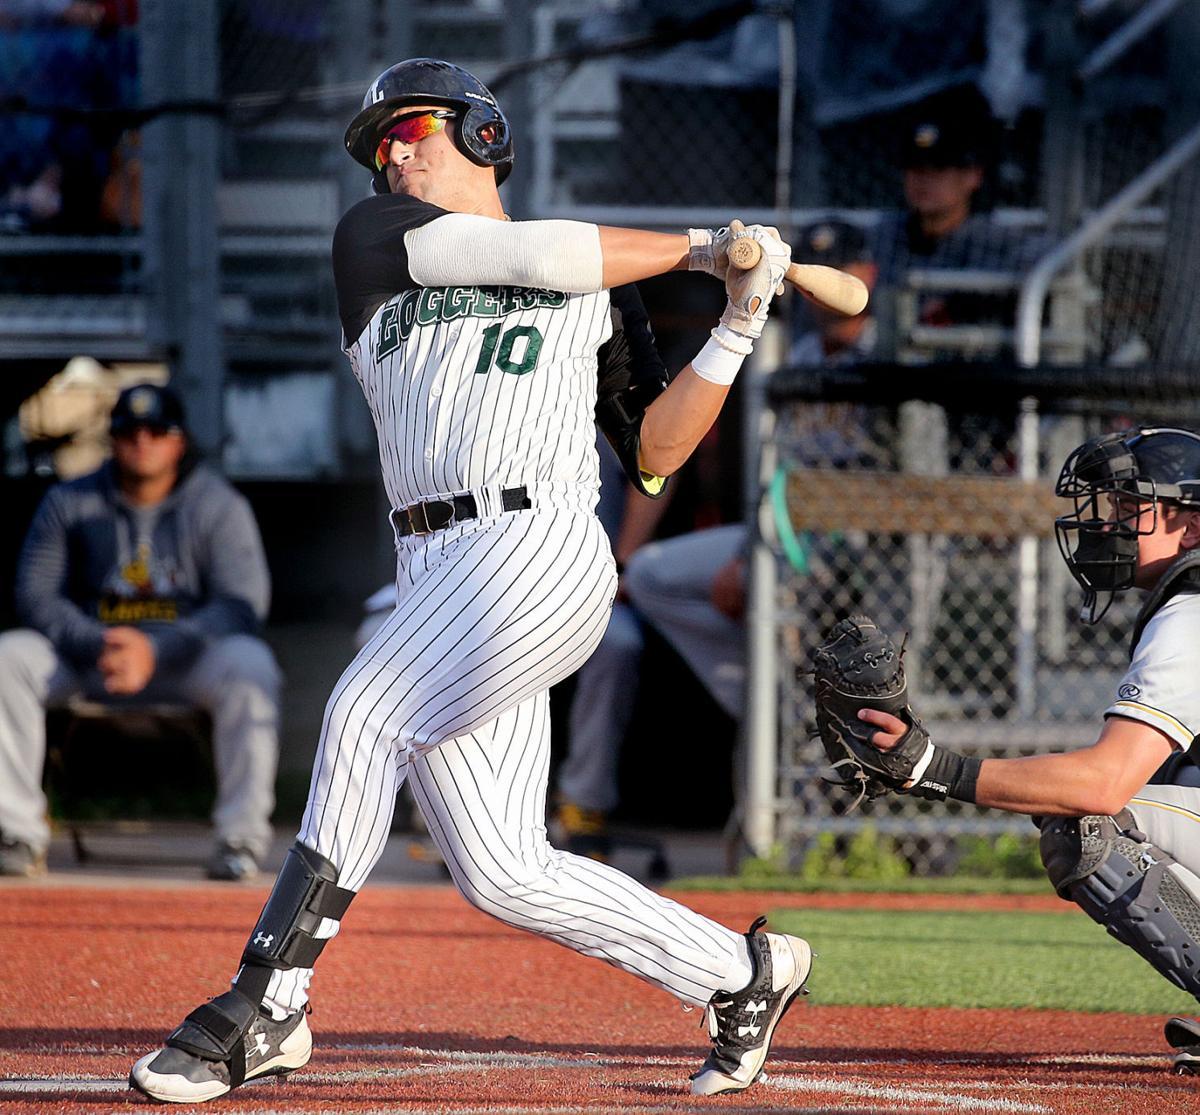 La Crosse Loggers: David Villar swinging big-time bat